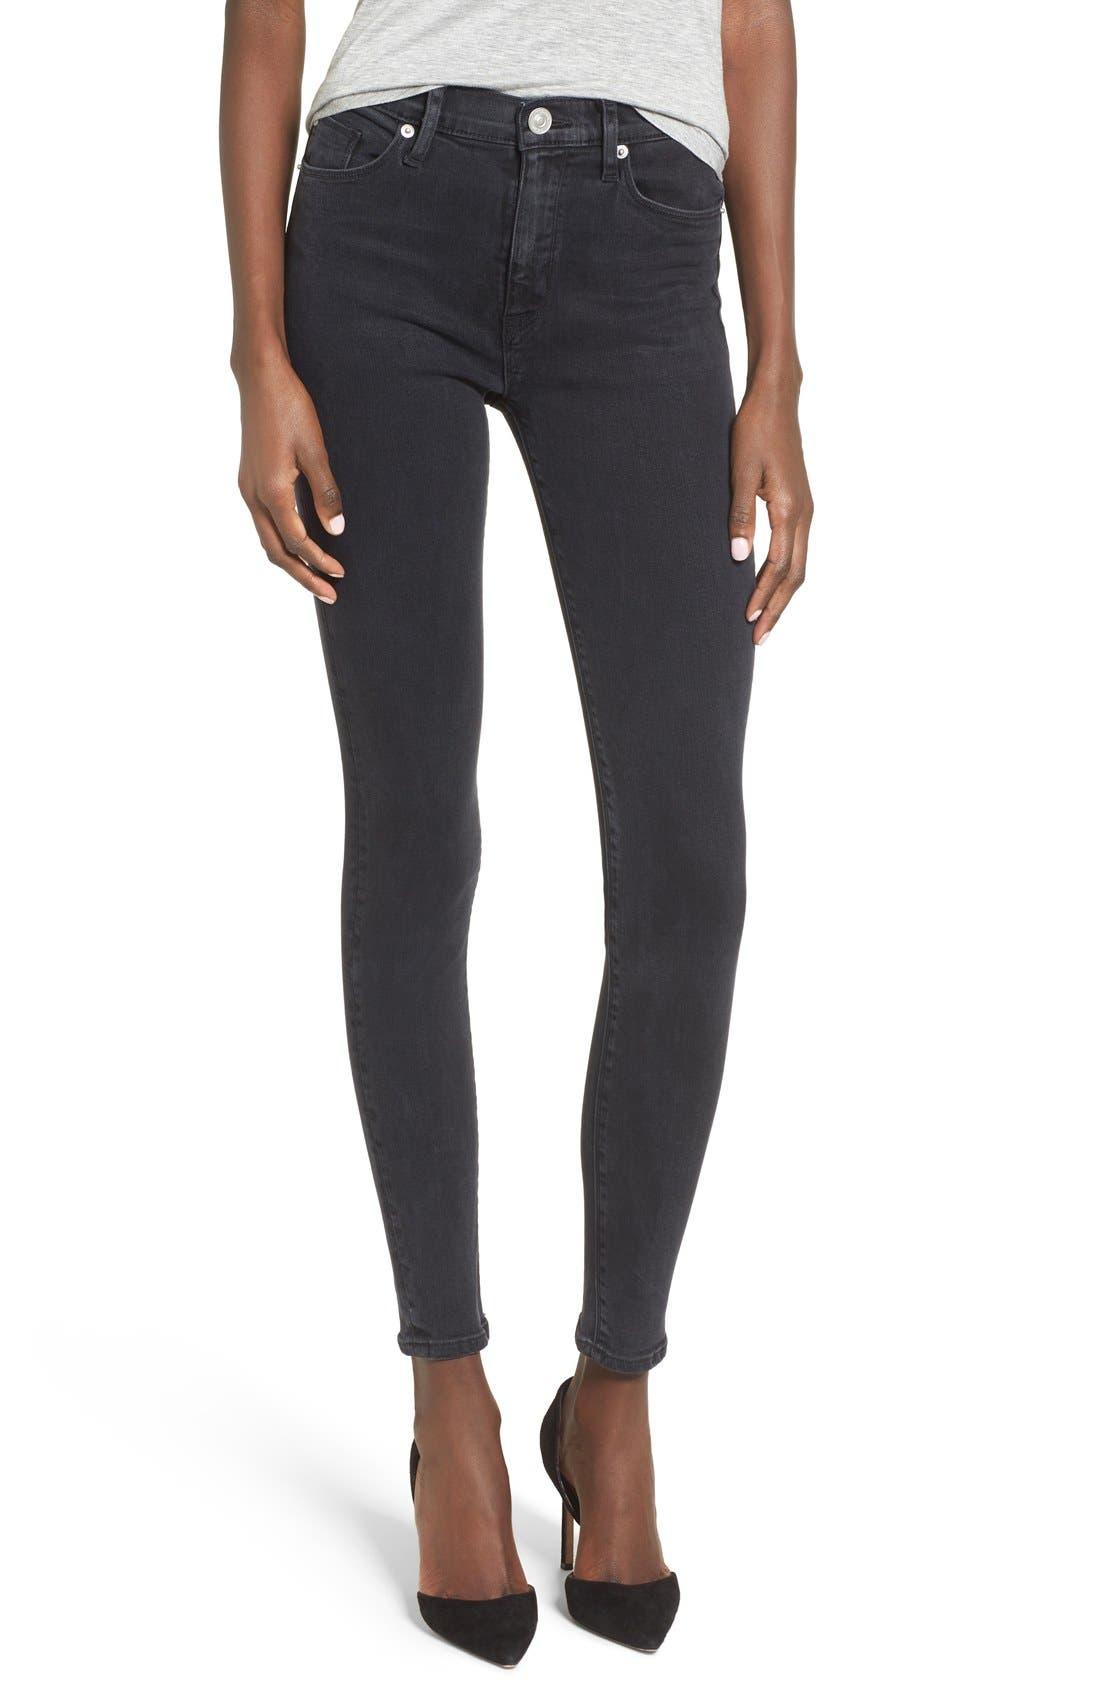 Alternate Image 1 Selected - Hudson Jeans Barbara High Waist Super Skinny Jeans (Bazooka)